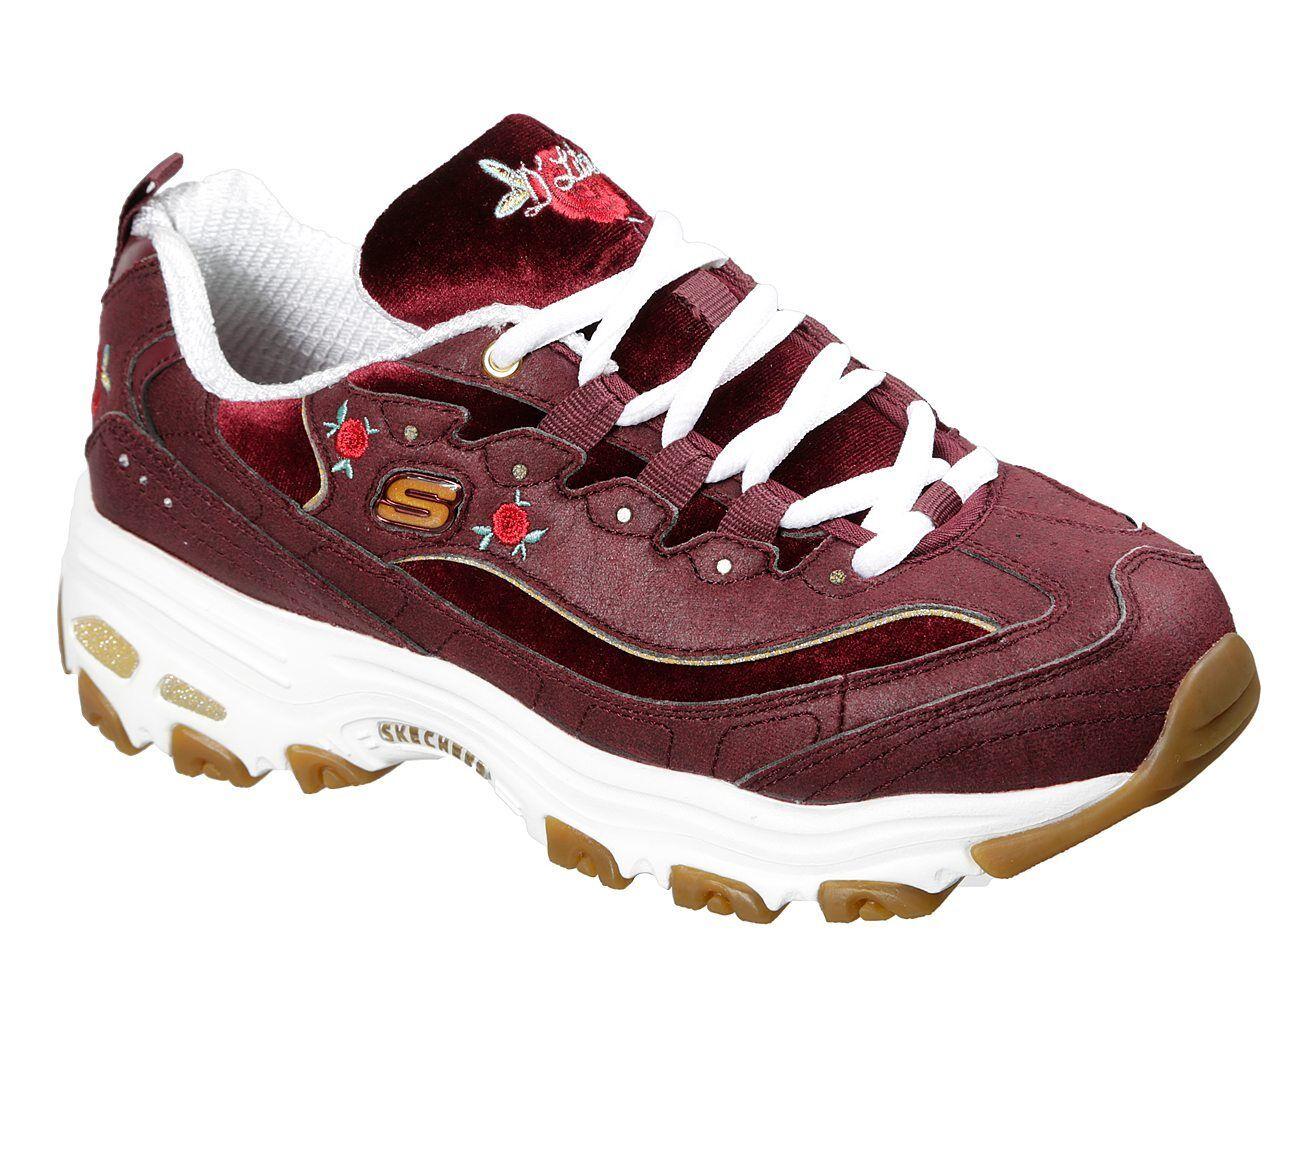 NUOVO Sneakers Skechers da donna Sneakers NUOVO D 'Lites-ROSE BLOOMS ROSSO 8eb249